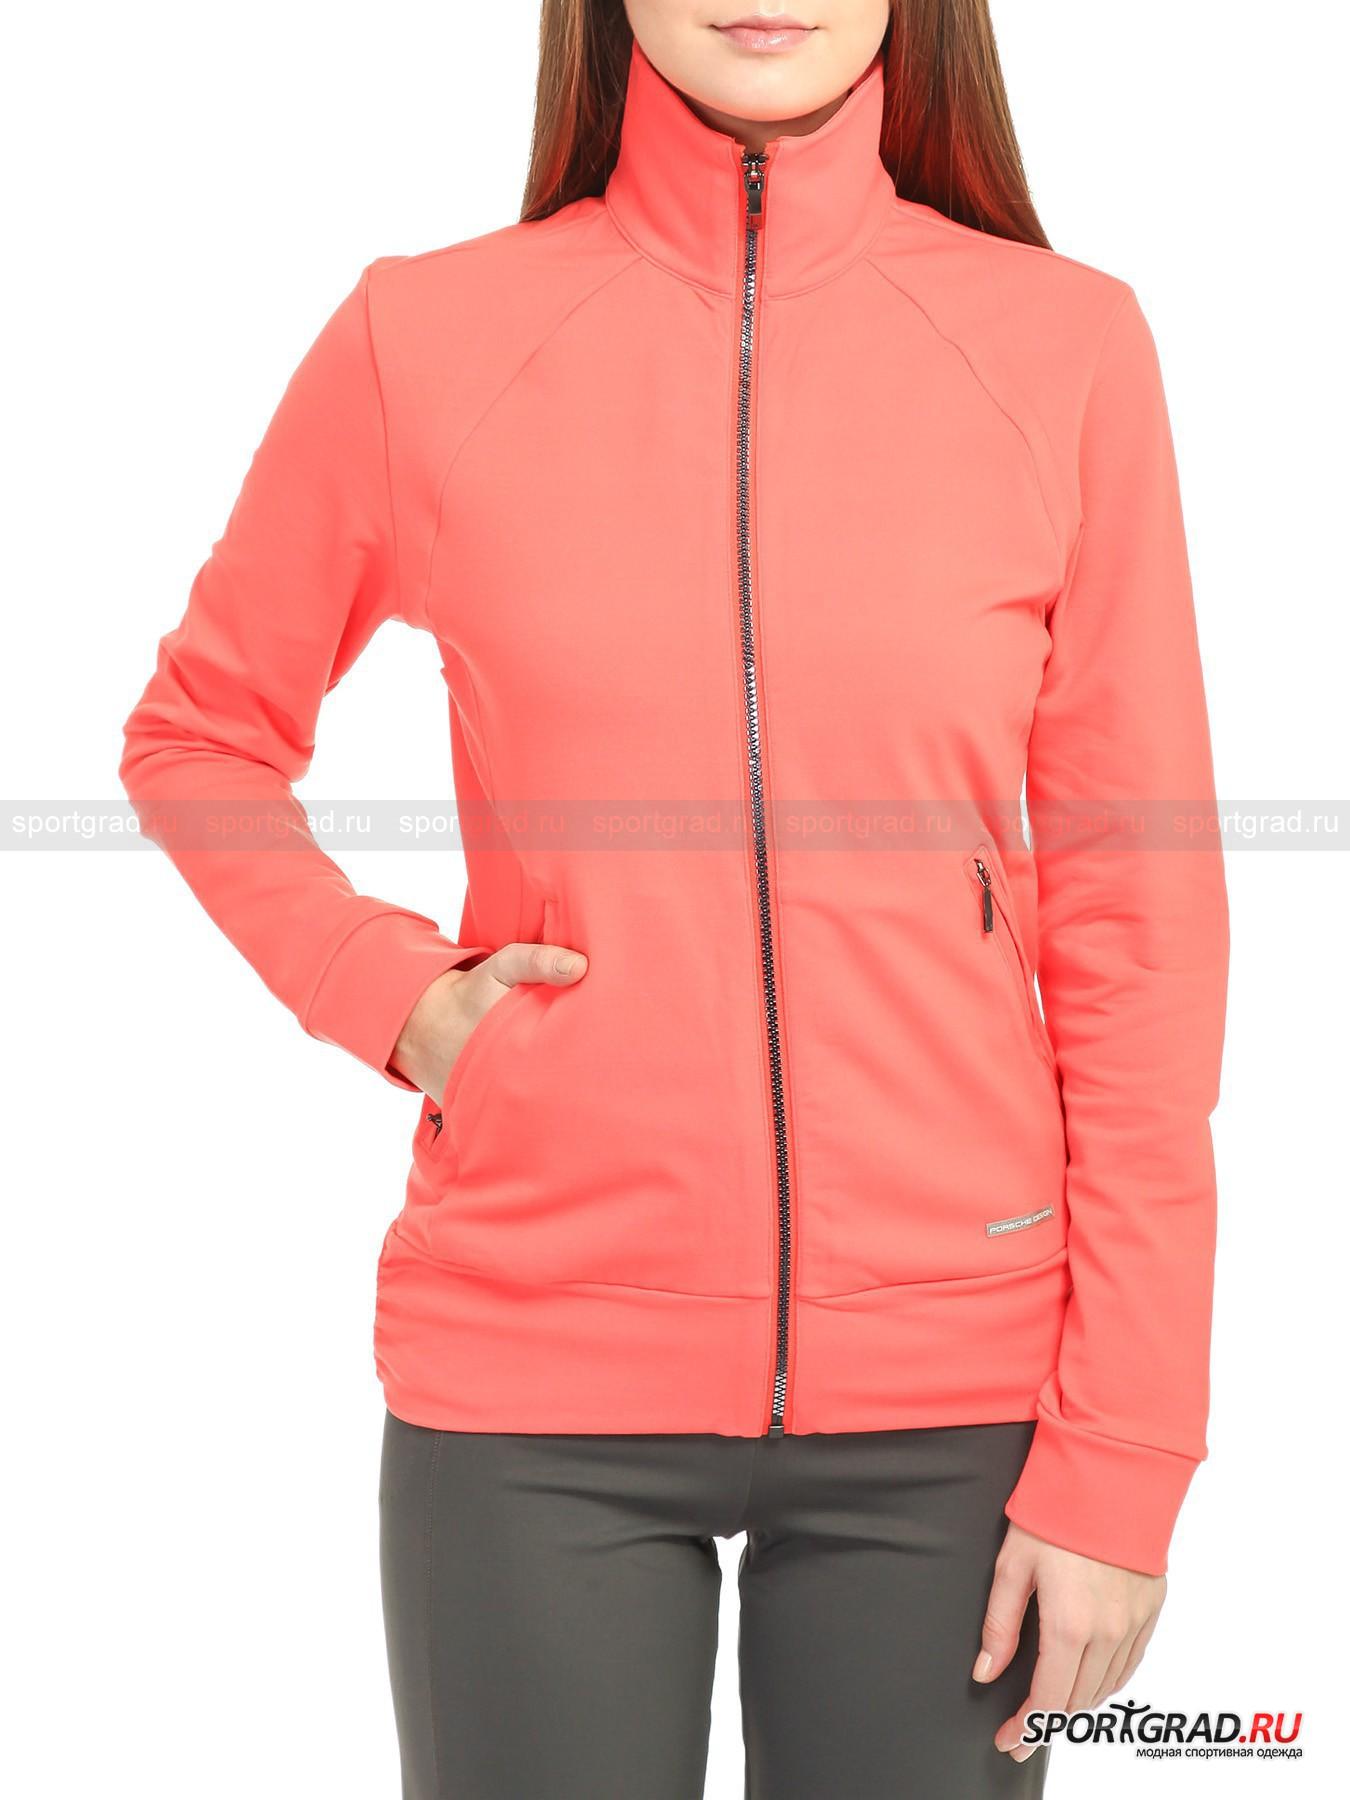 ��������� ������� �������������� Warmup jacket II PORSCHE DESIGN ��� ������